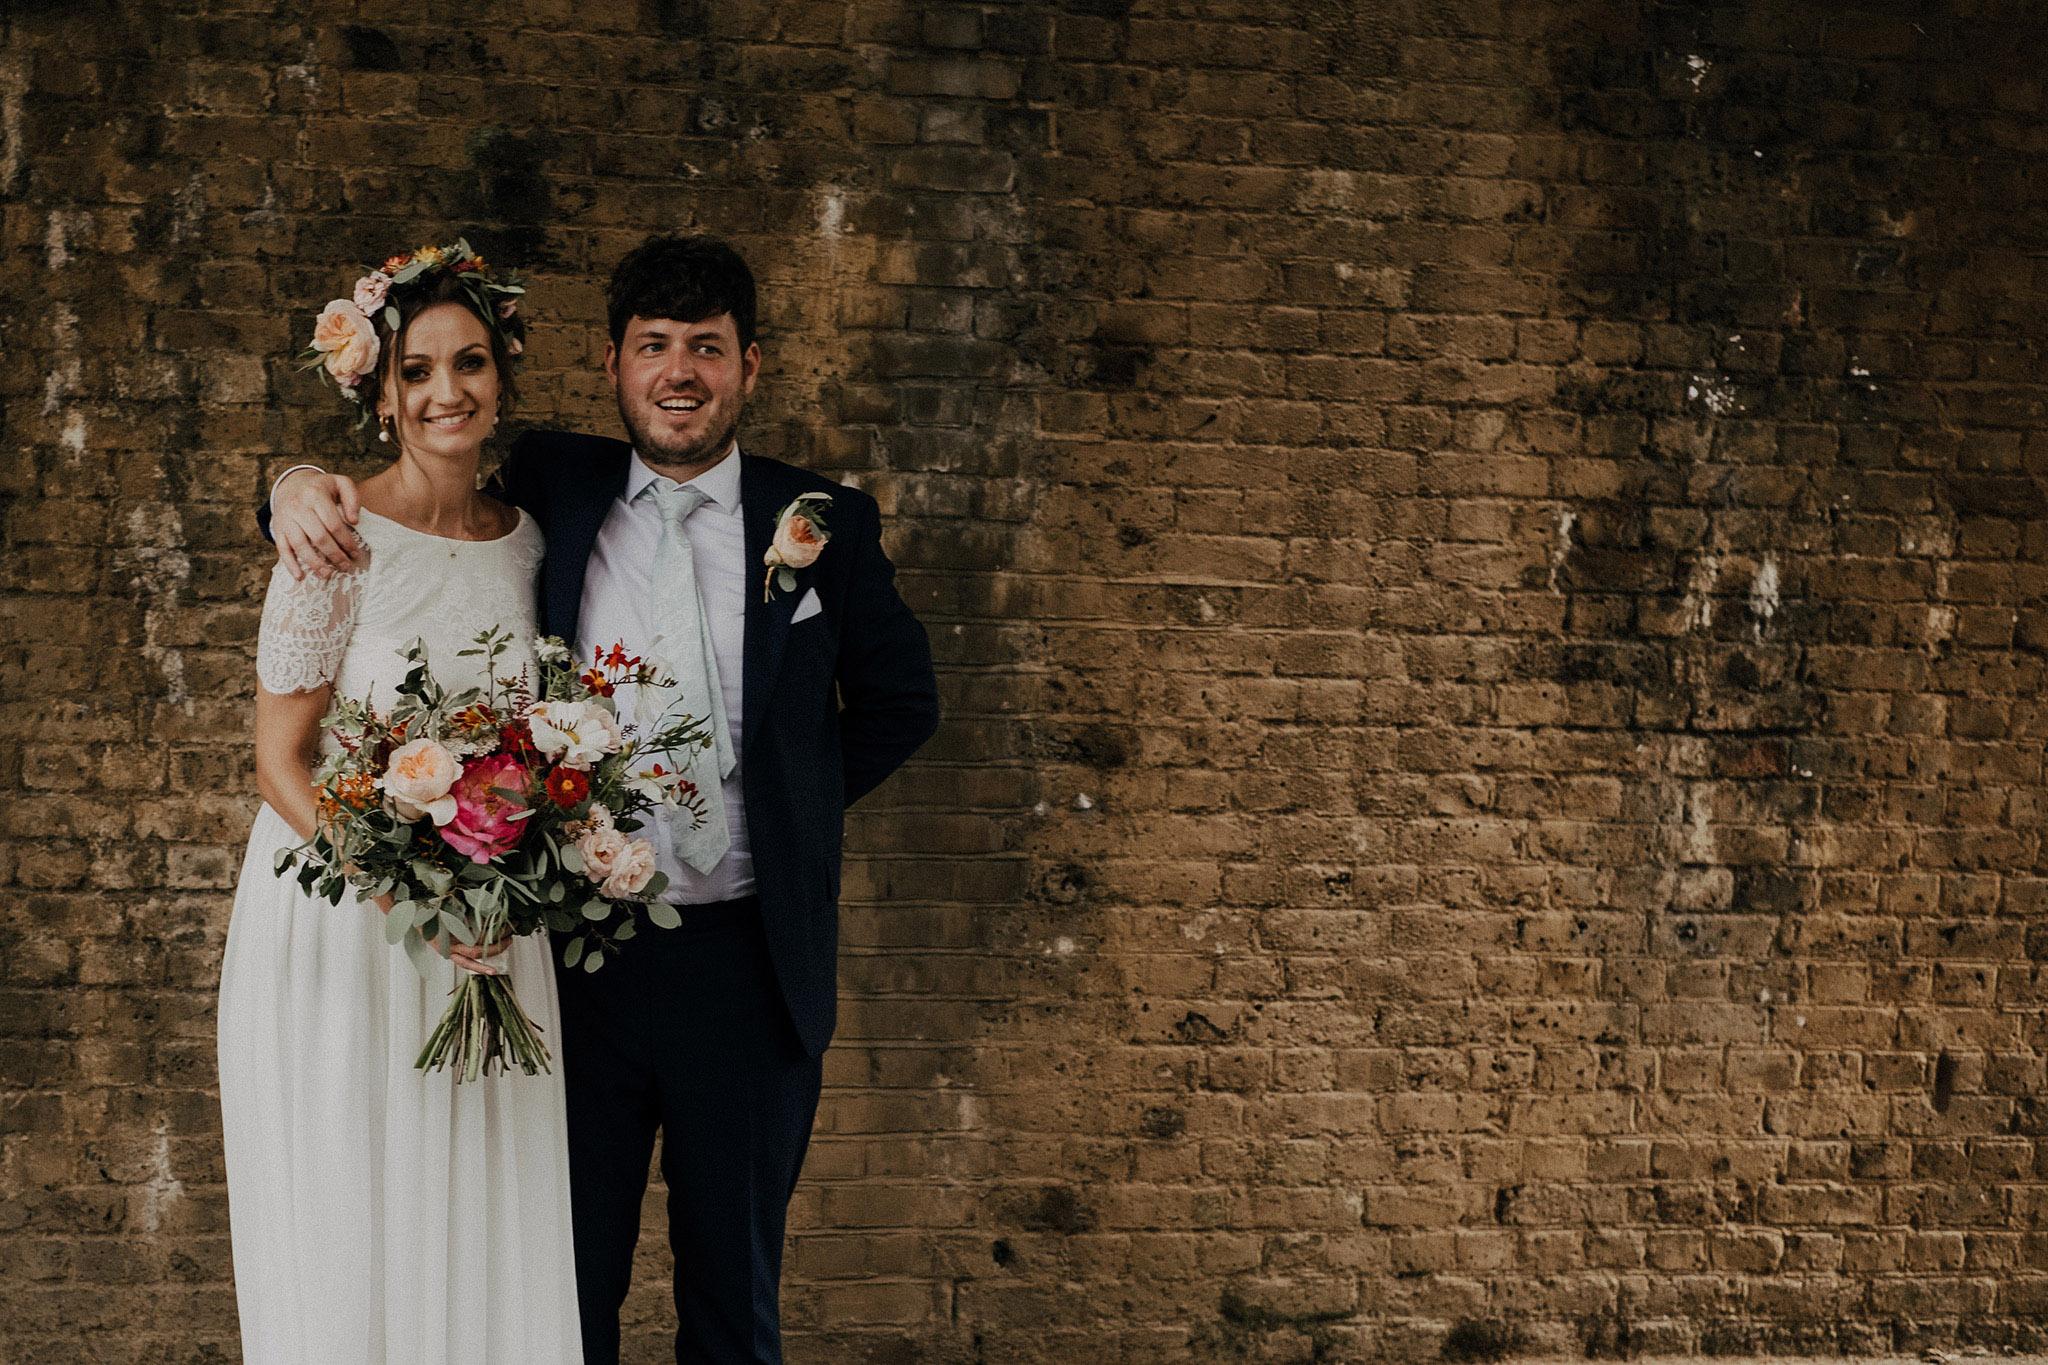 Islington-town-hall-wedding63.jpg